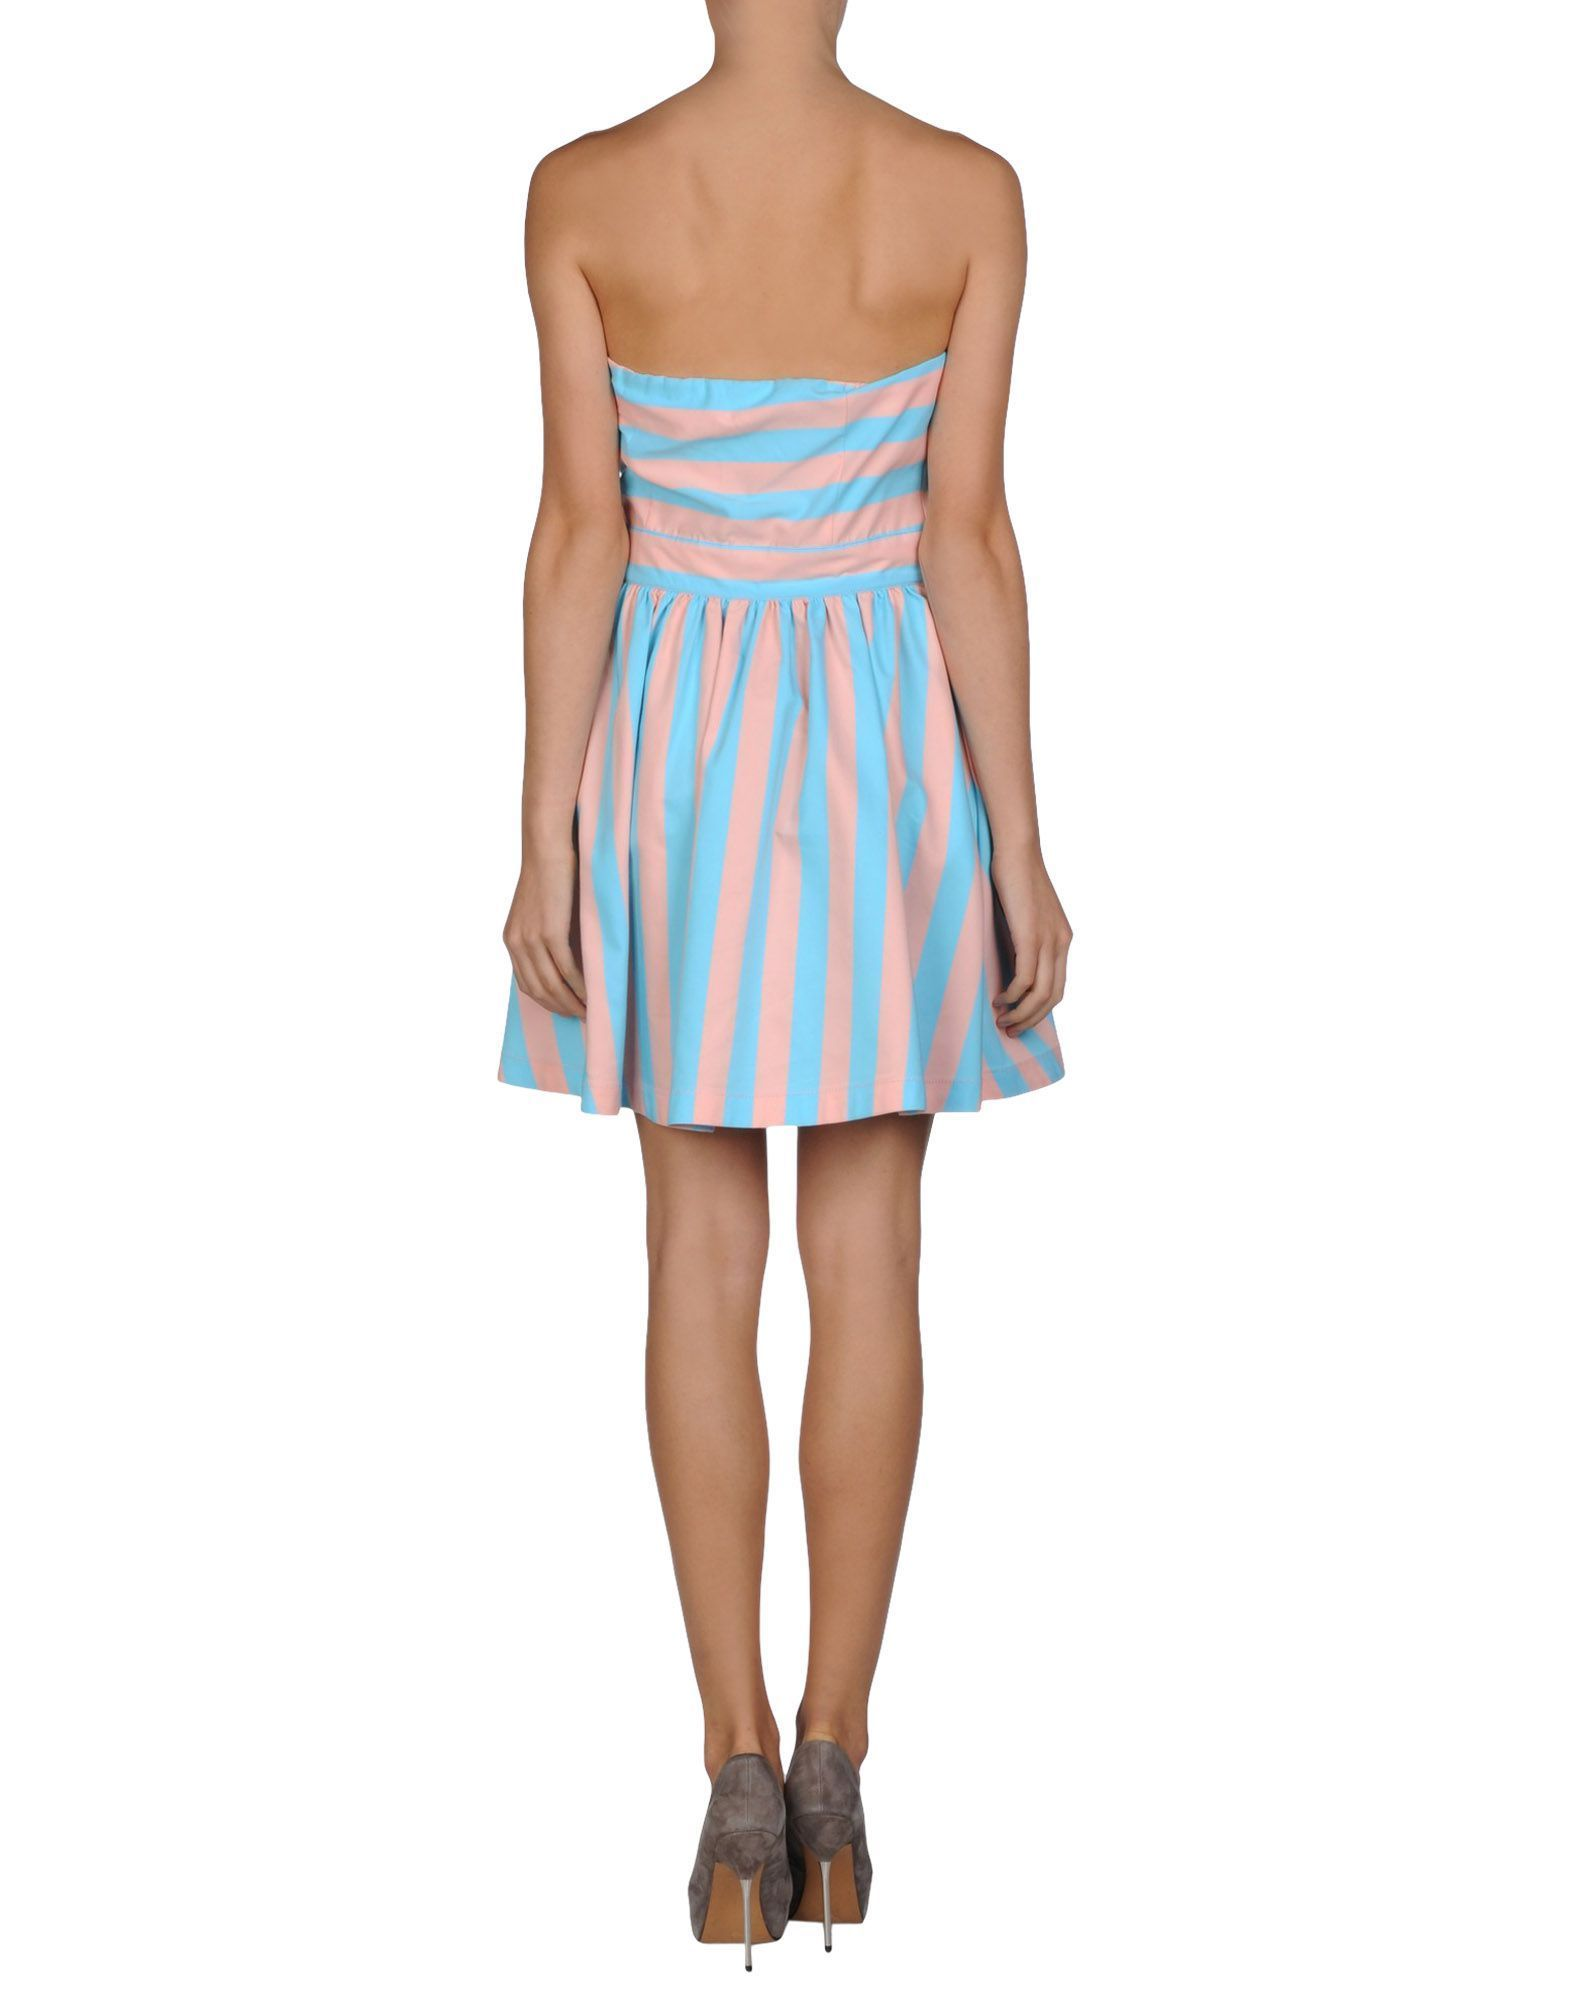 sale love moschino love moschino mini dress dresses buyma. Black Bedroom Furniture Sets. Home Design Ideas